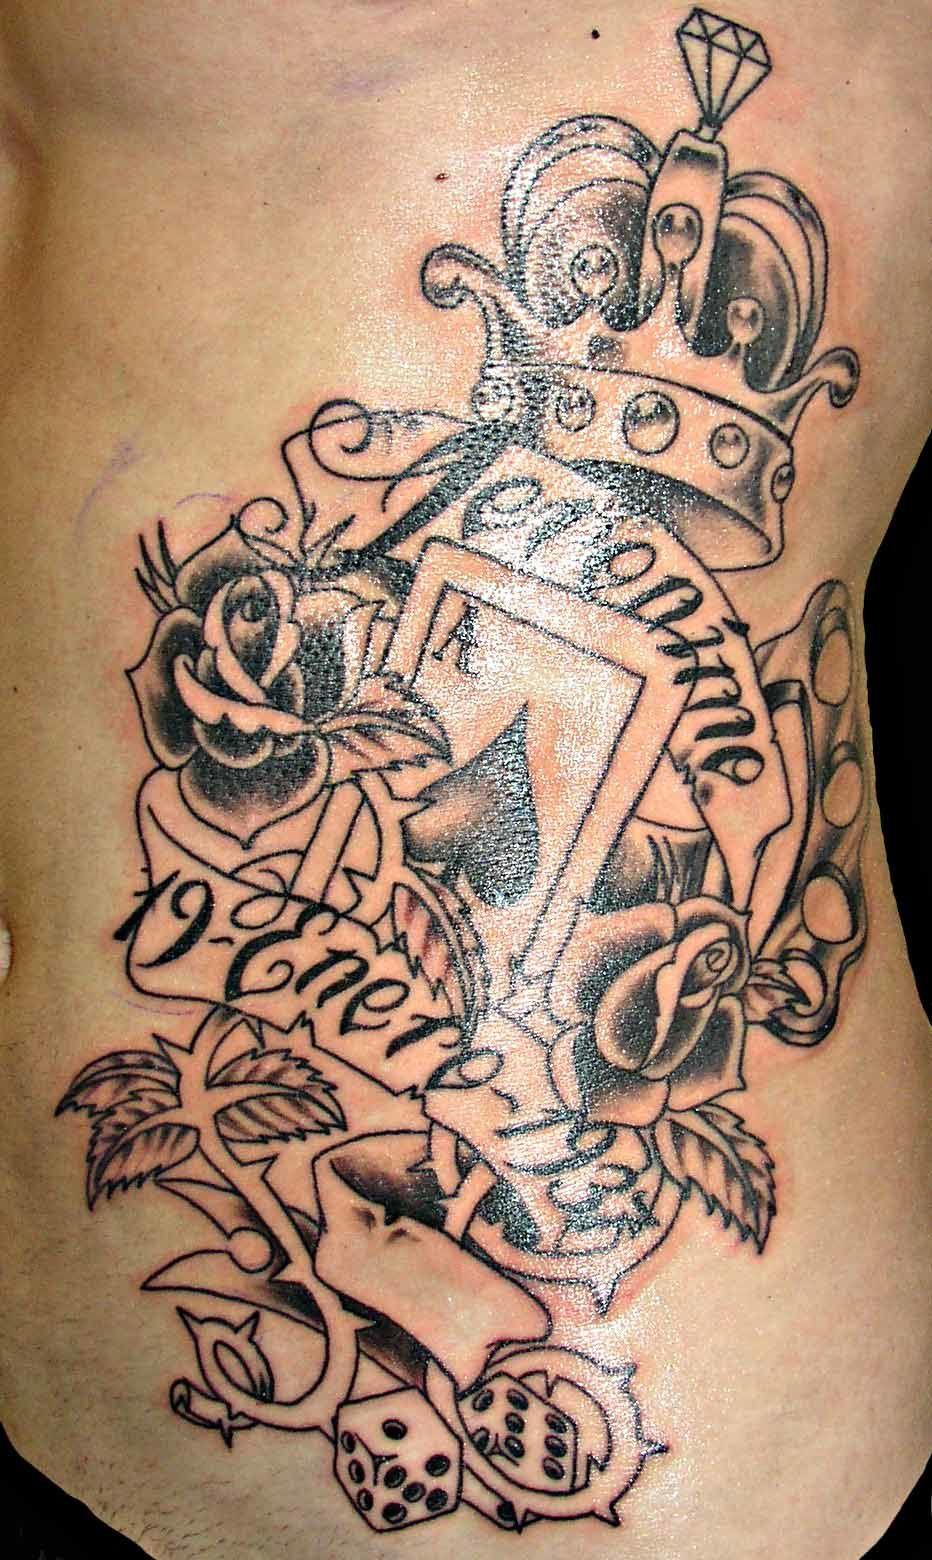 Tatuajes Poker Significado Best Casino Online